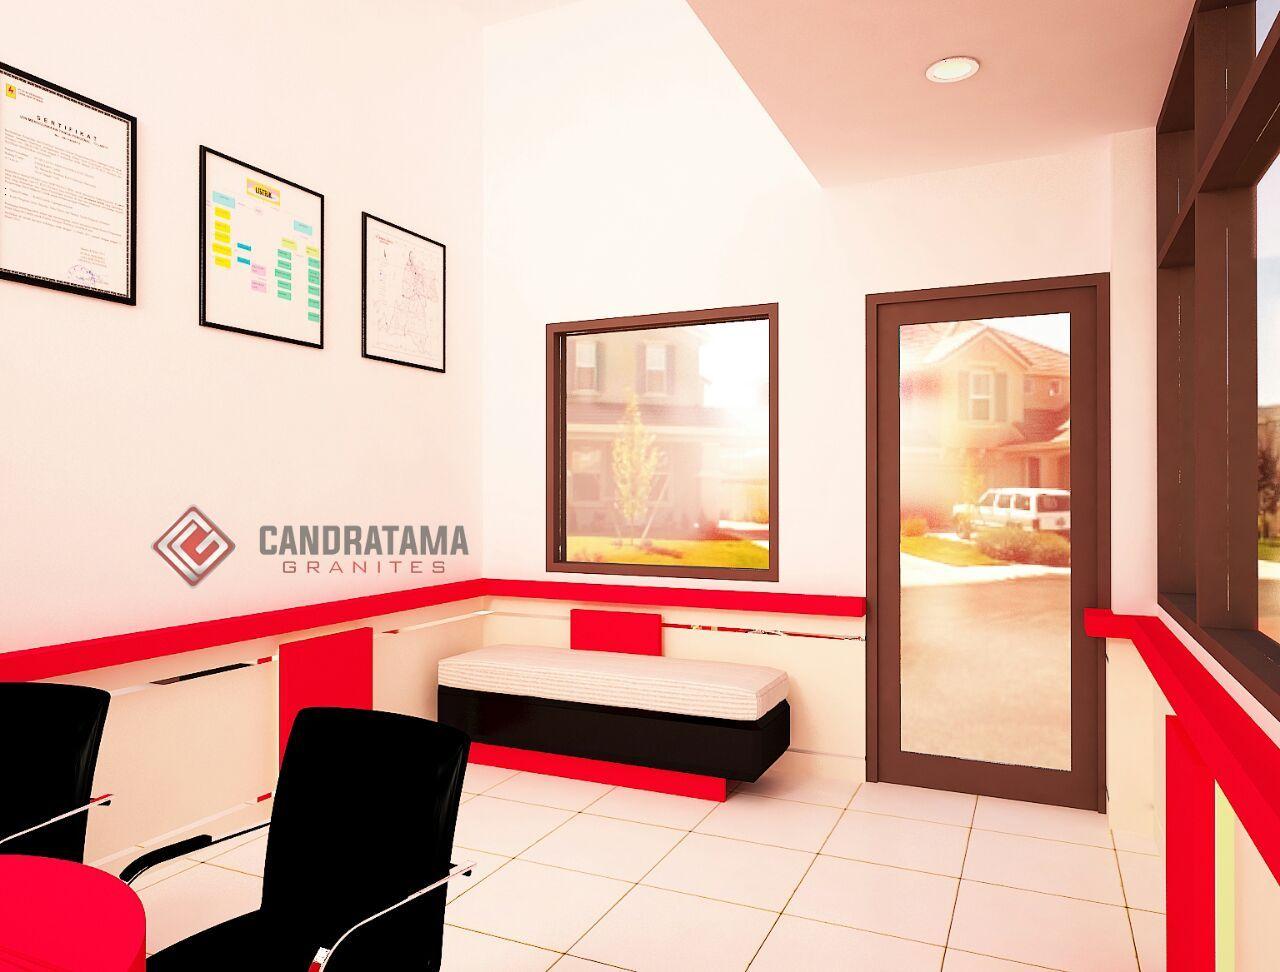 Interior kantor minimalis tropis 3 lantai - Jasa Interior Kediri Desain Interior Kantor Kediri